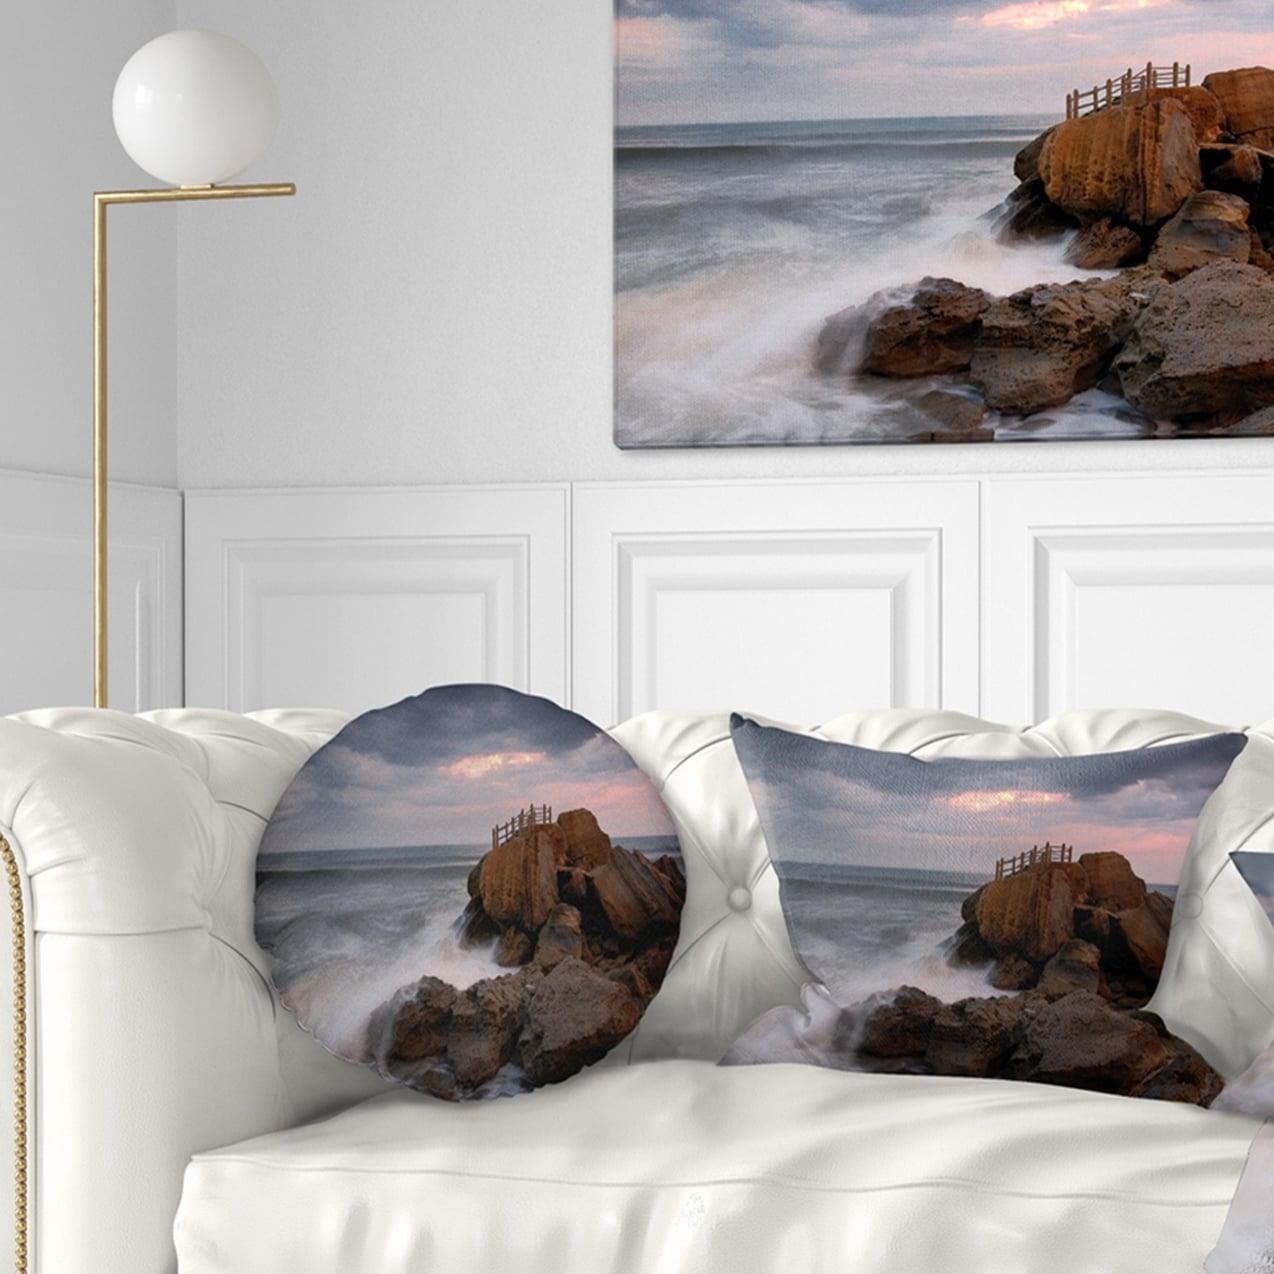 Designart CU10678-16-16-C The Fantasy Island with Large Rocks Seashore Round Cushion Cover for Living Room Sofa Throw Pillow 16